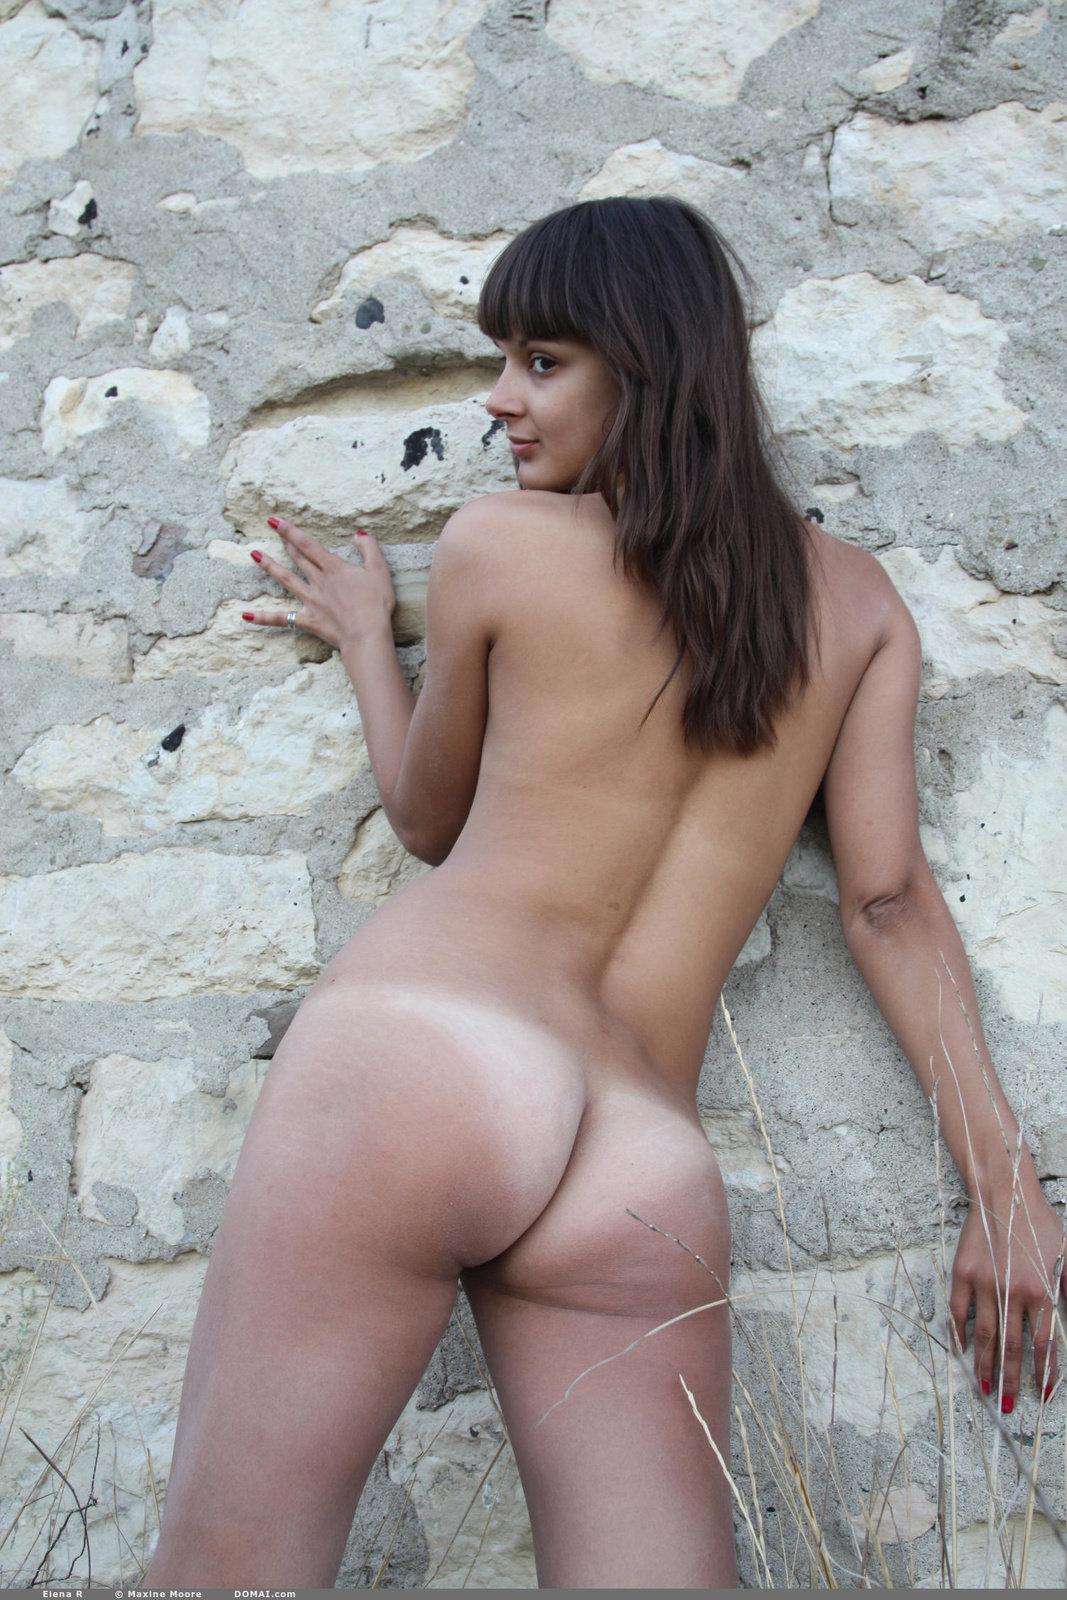 R nude pics